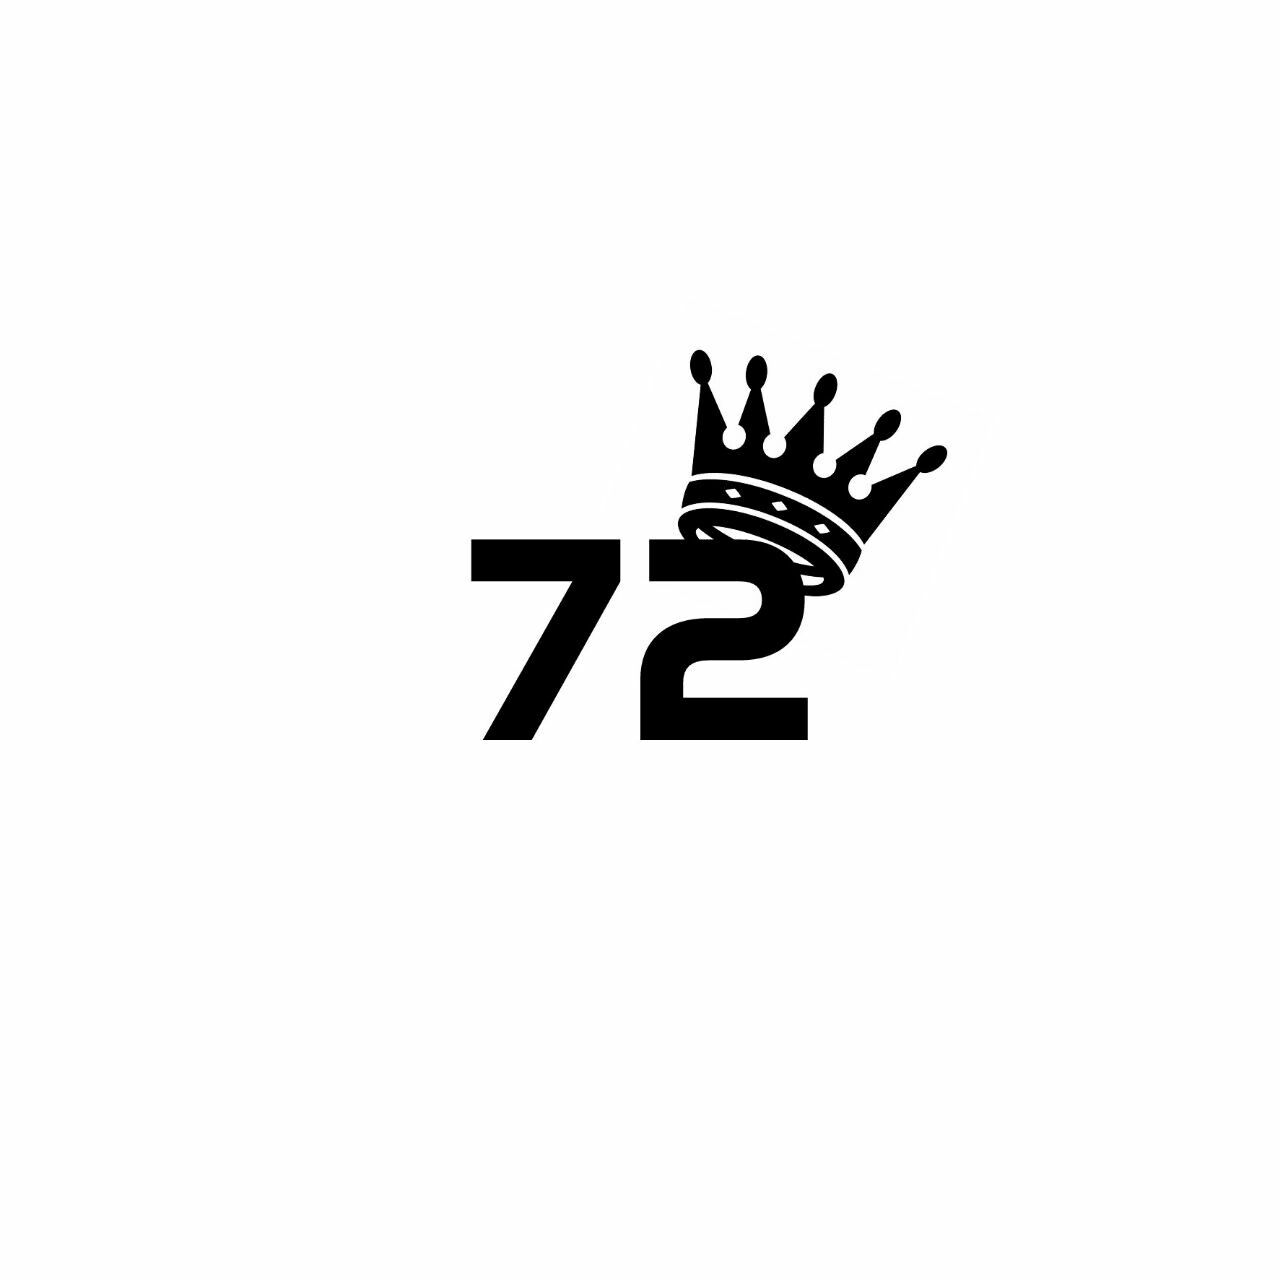 SALUTE 72.IMAGE